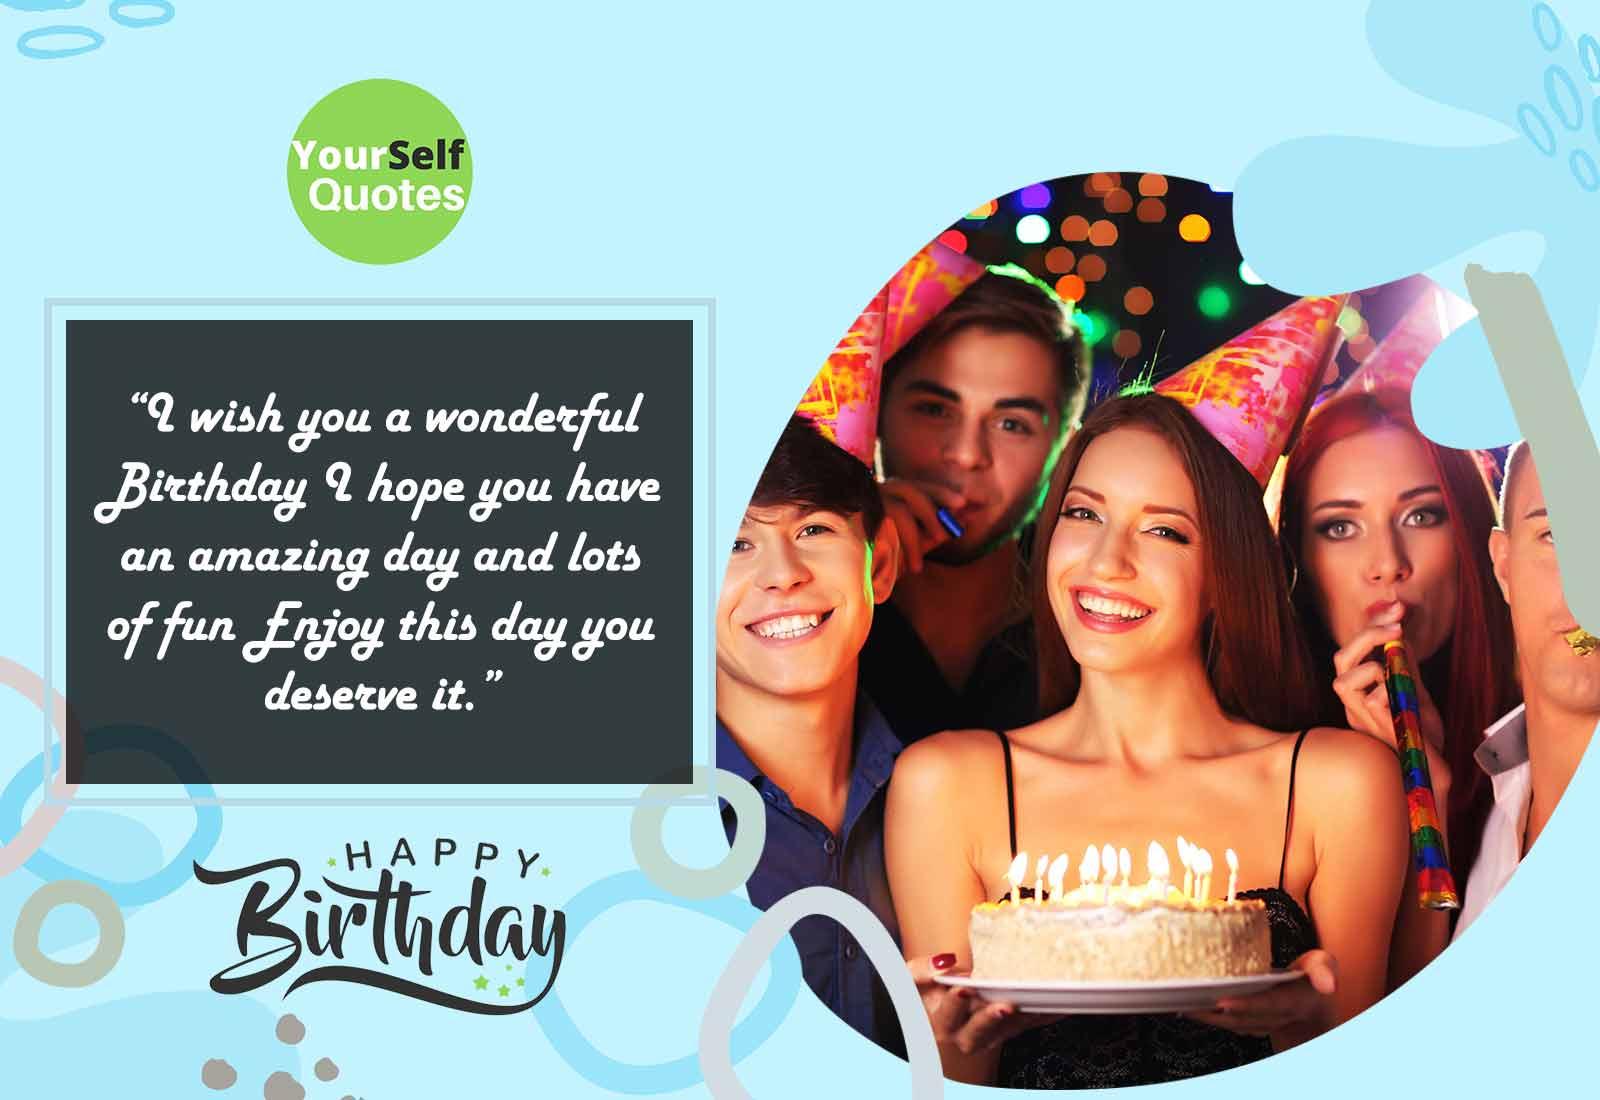 Wishing a Very Happy Birthday